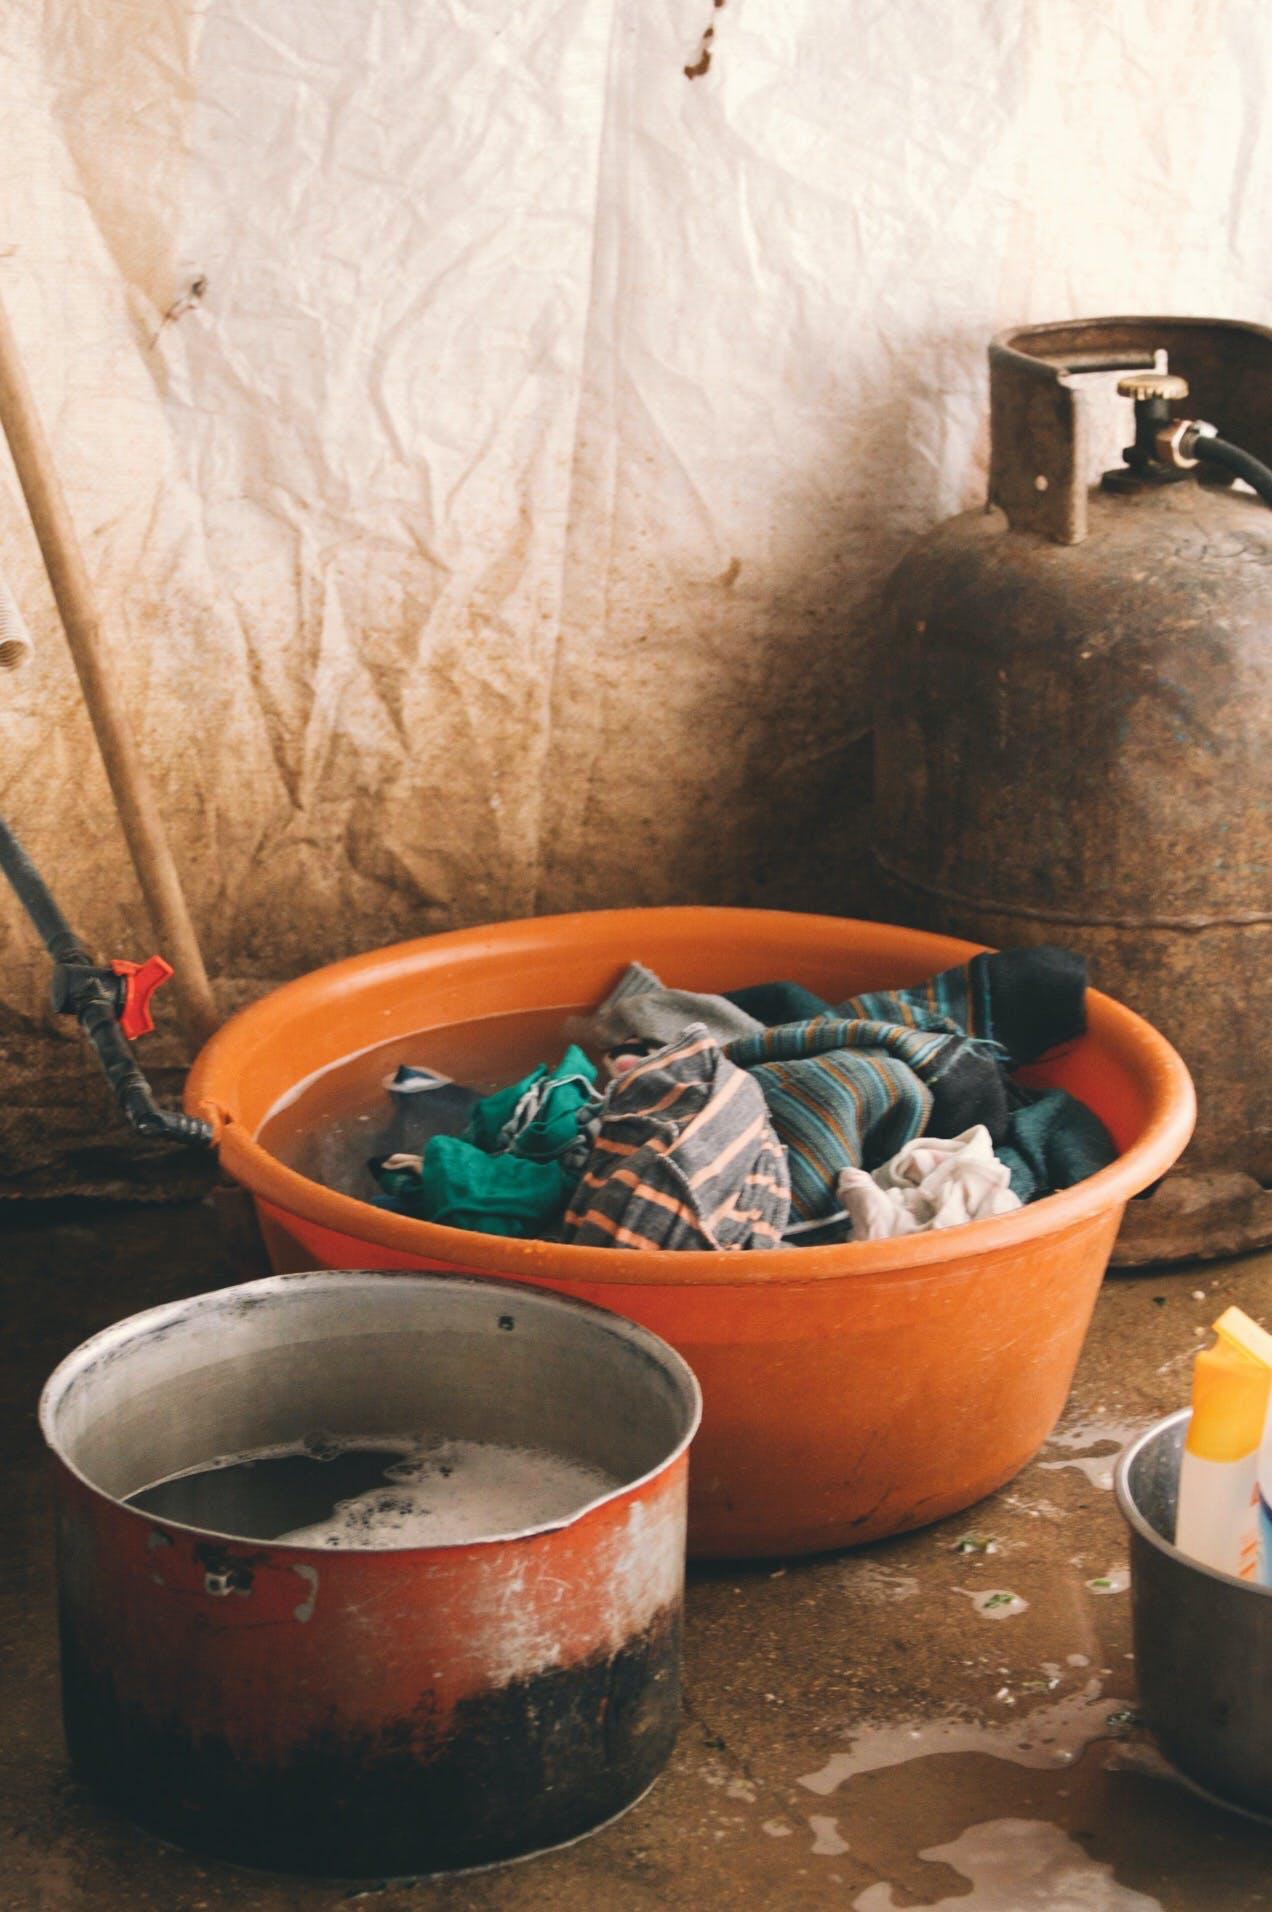 Rasmia washes laundry inside her small home in Lebanon.